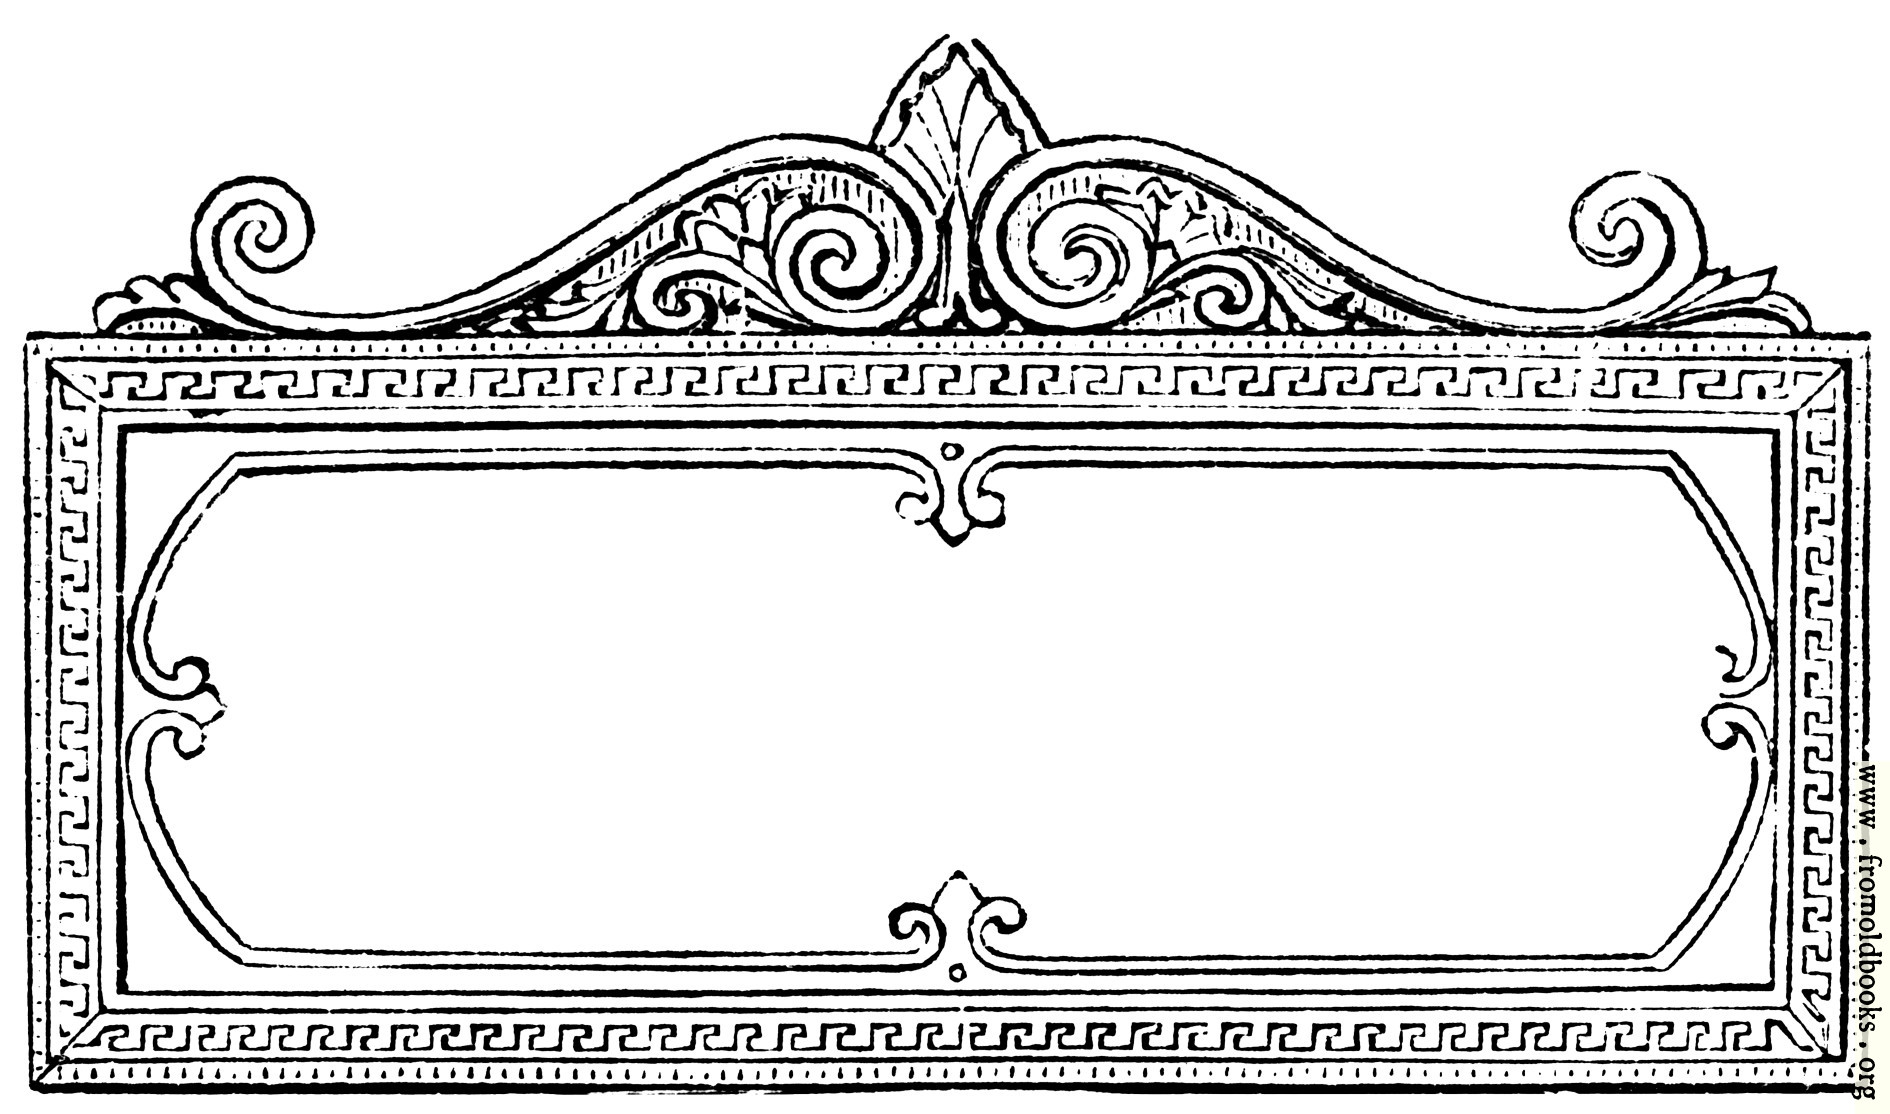 [Picture: Ornate Rectangular Frame]